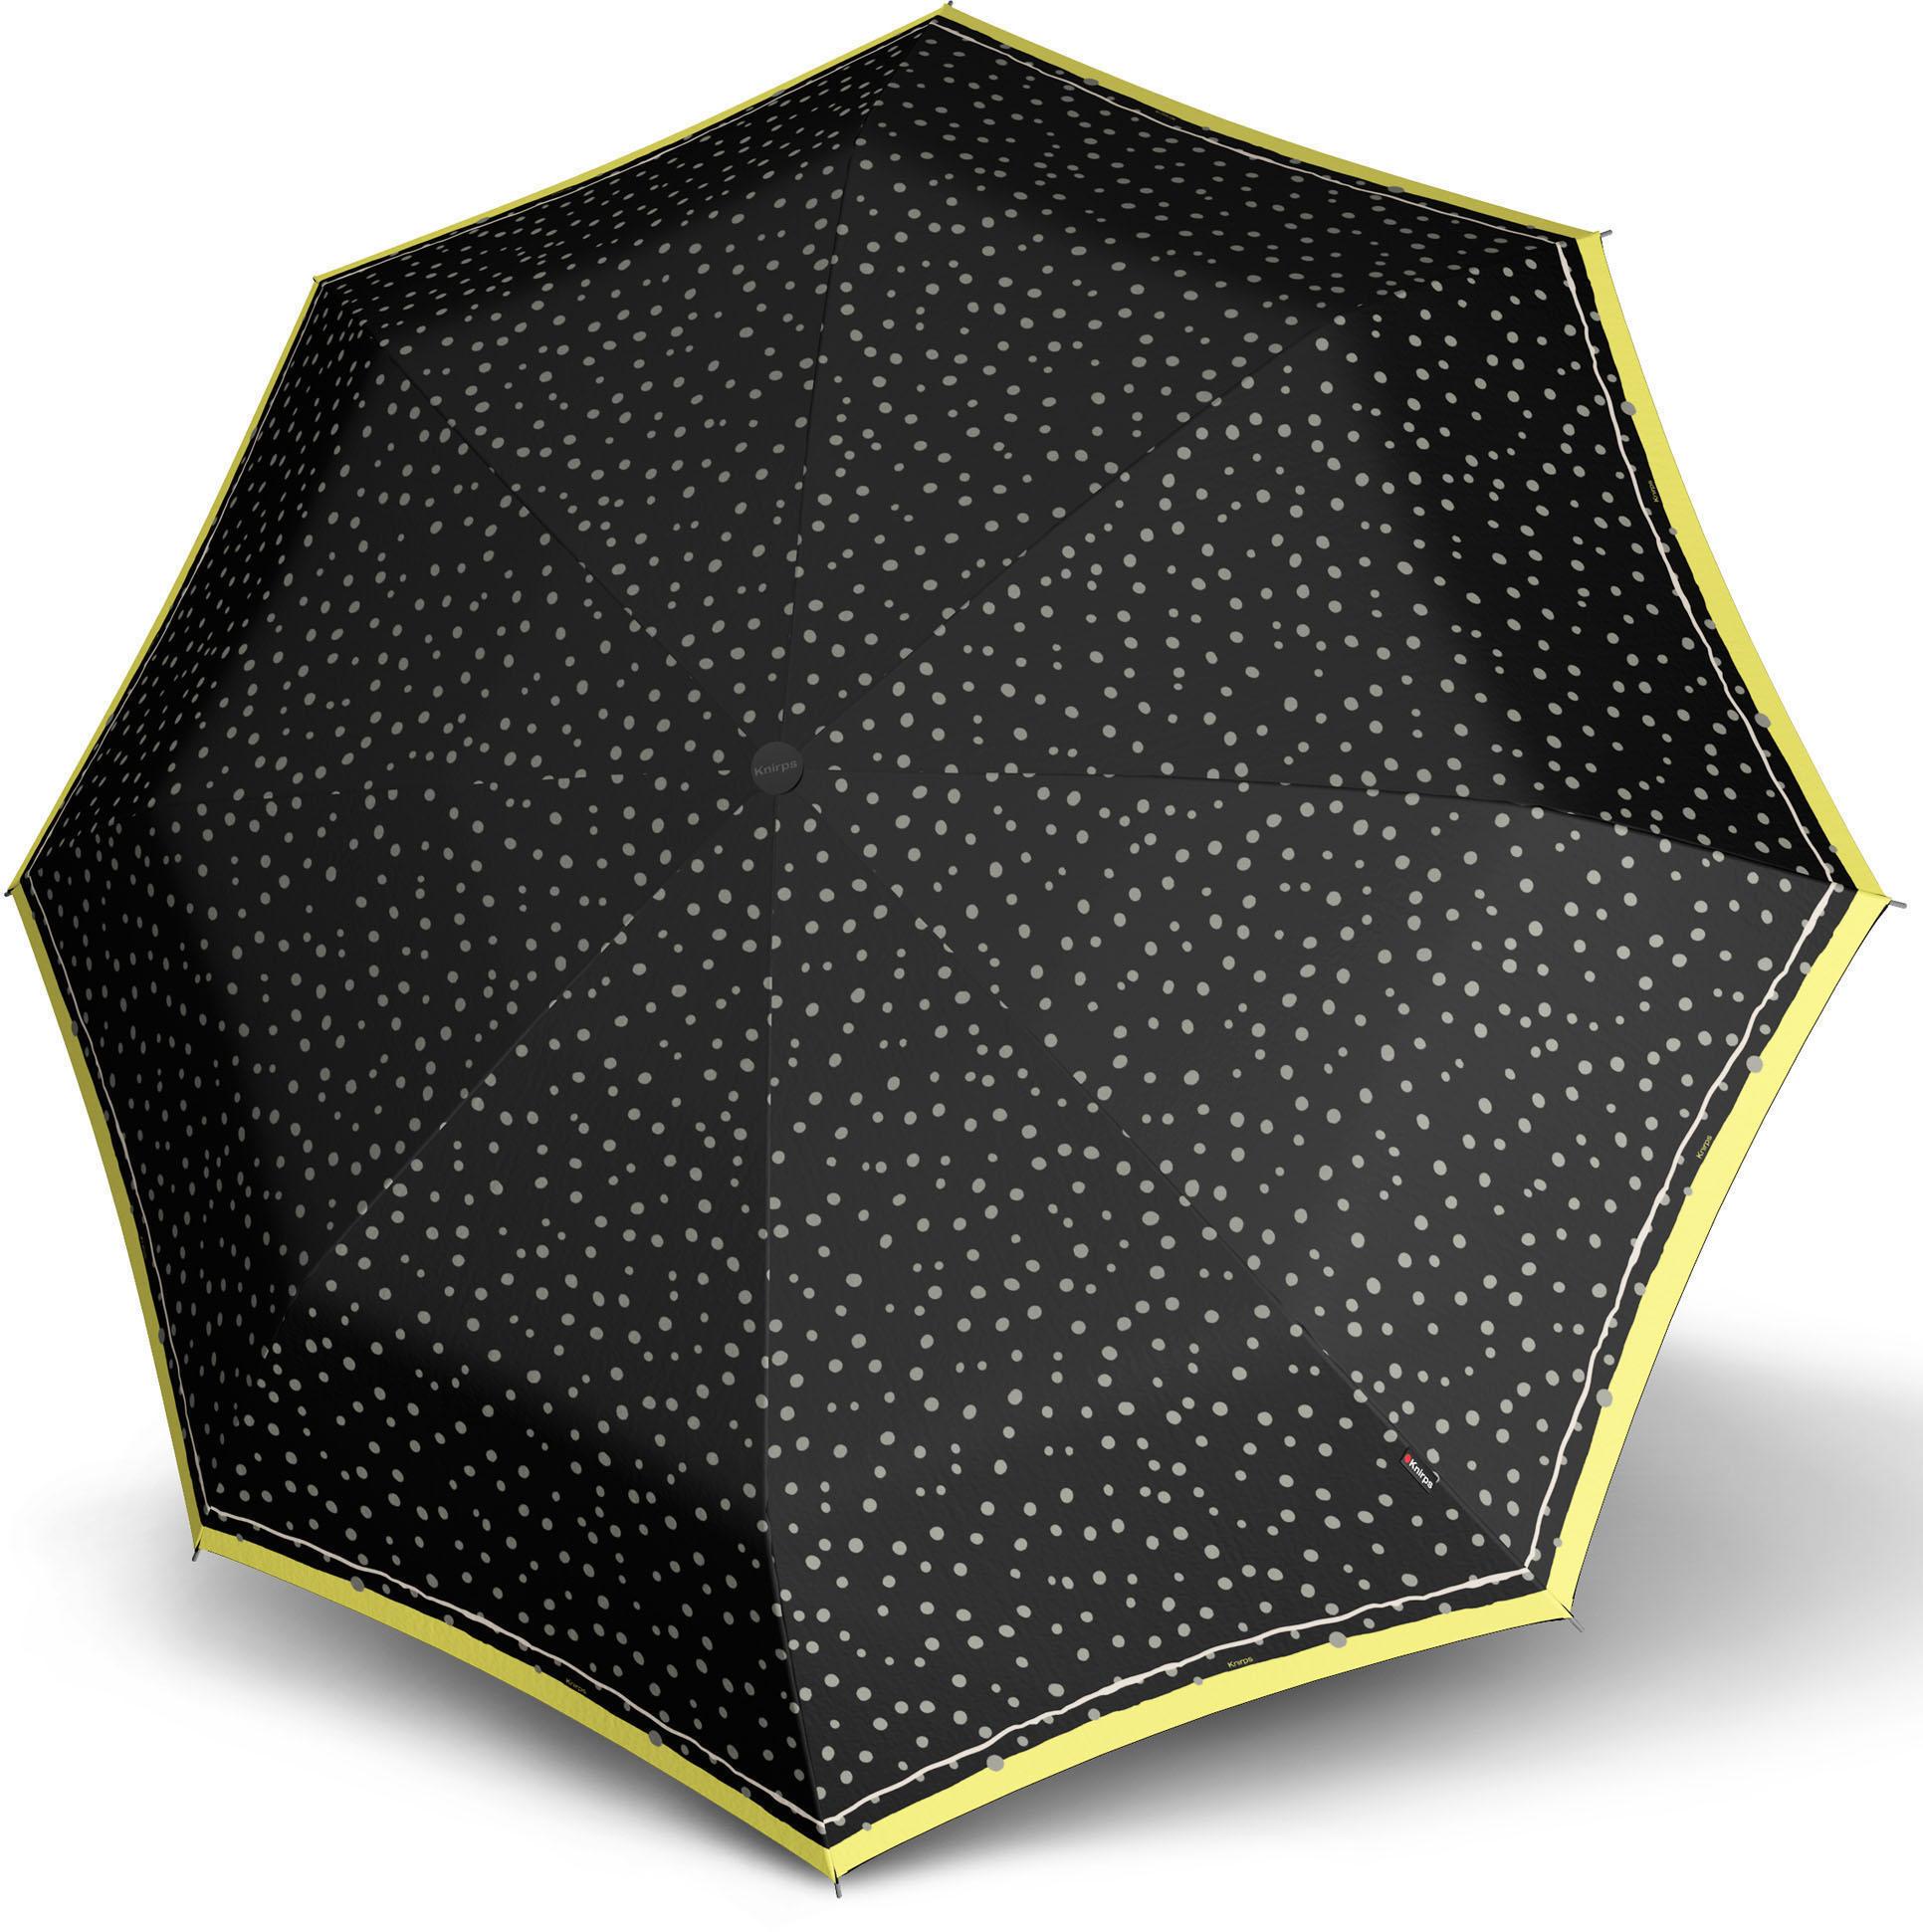 Knirps®, Taschenregenschirm ´´X1´´ | Accessoires > Regenschirme > Sonstige Regenschirme | Schwarz | Polyester | KNIRPS